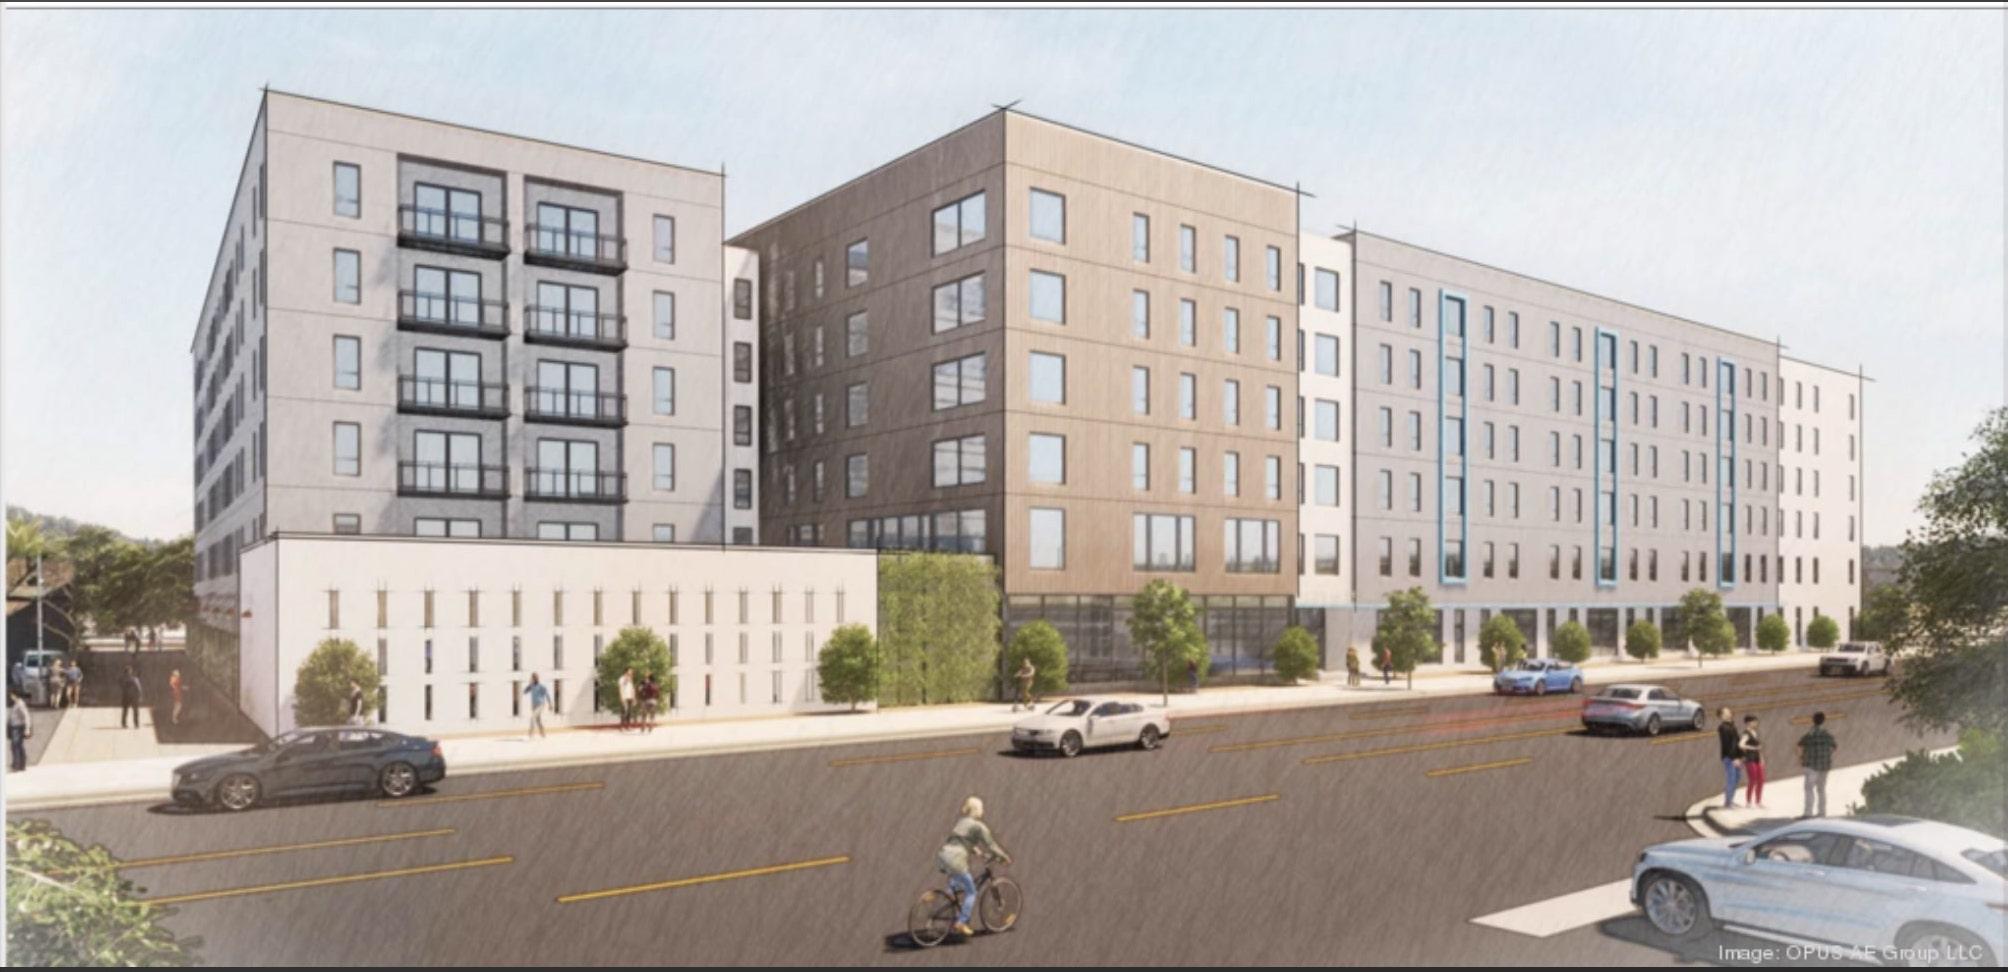 OPUS Student Housing Folsom Boulevard